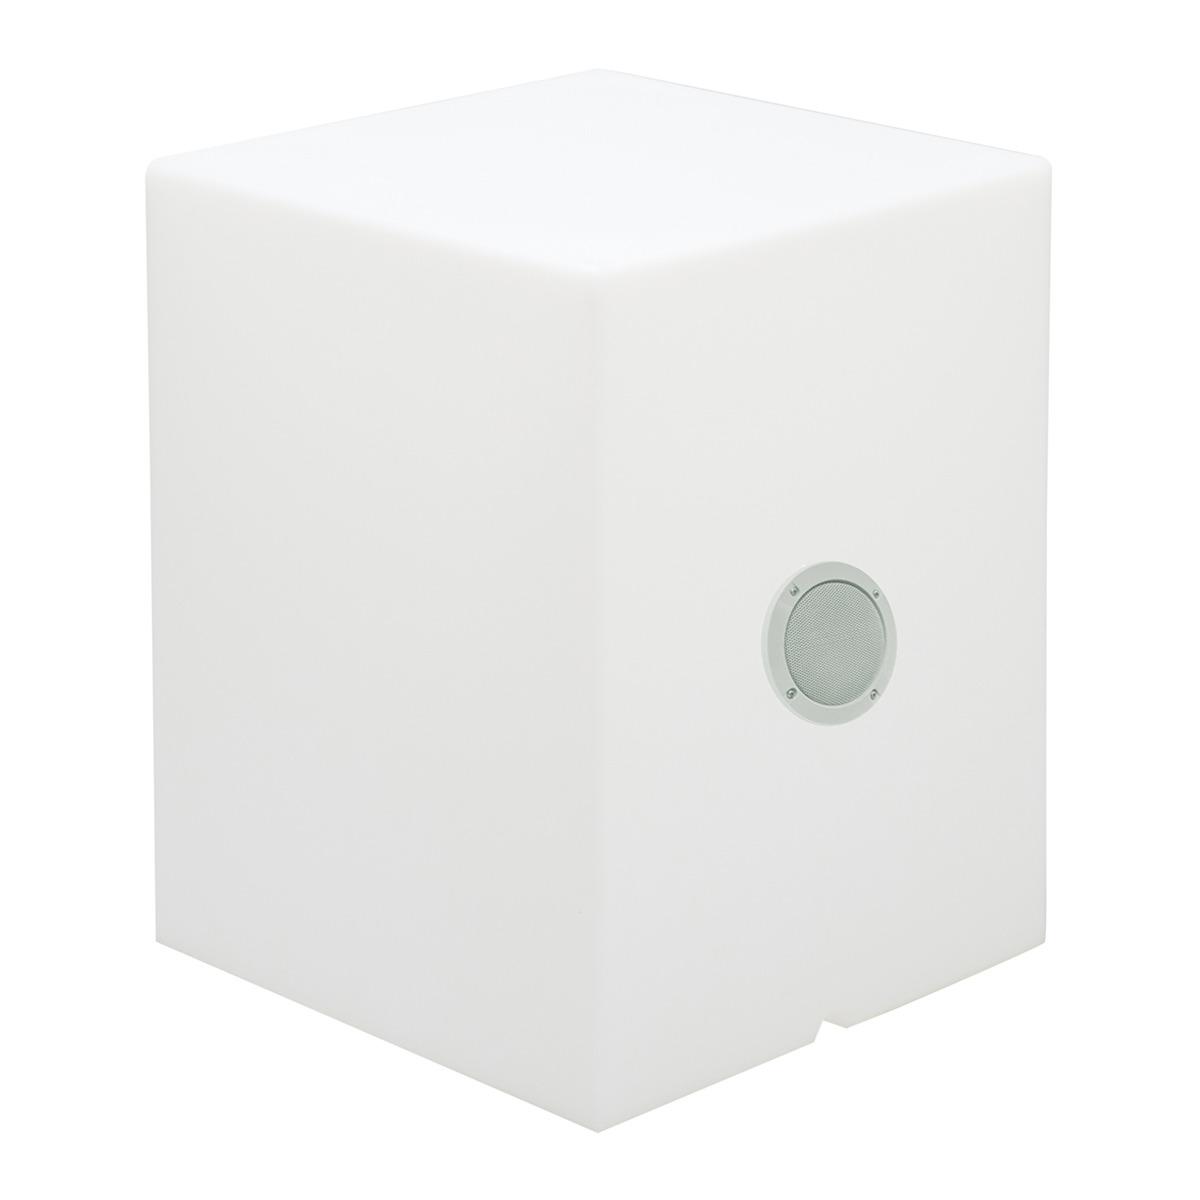 Cuby 55 Cubo iluminado Exterior play batería recargable LED RGB 43x43x53cm